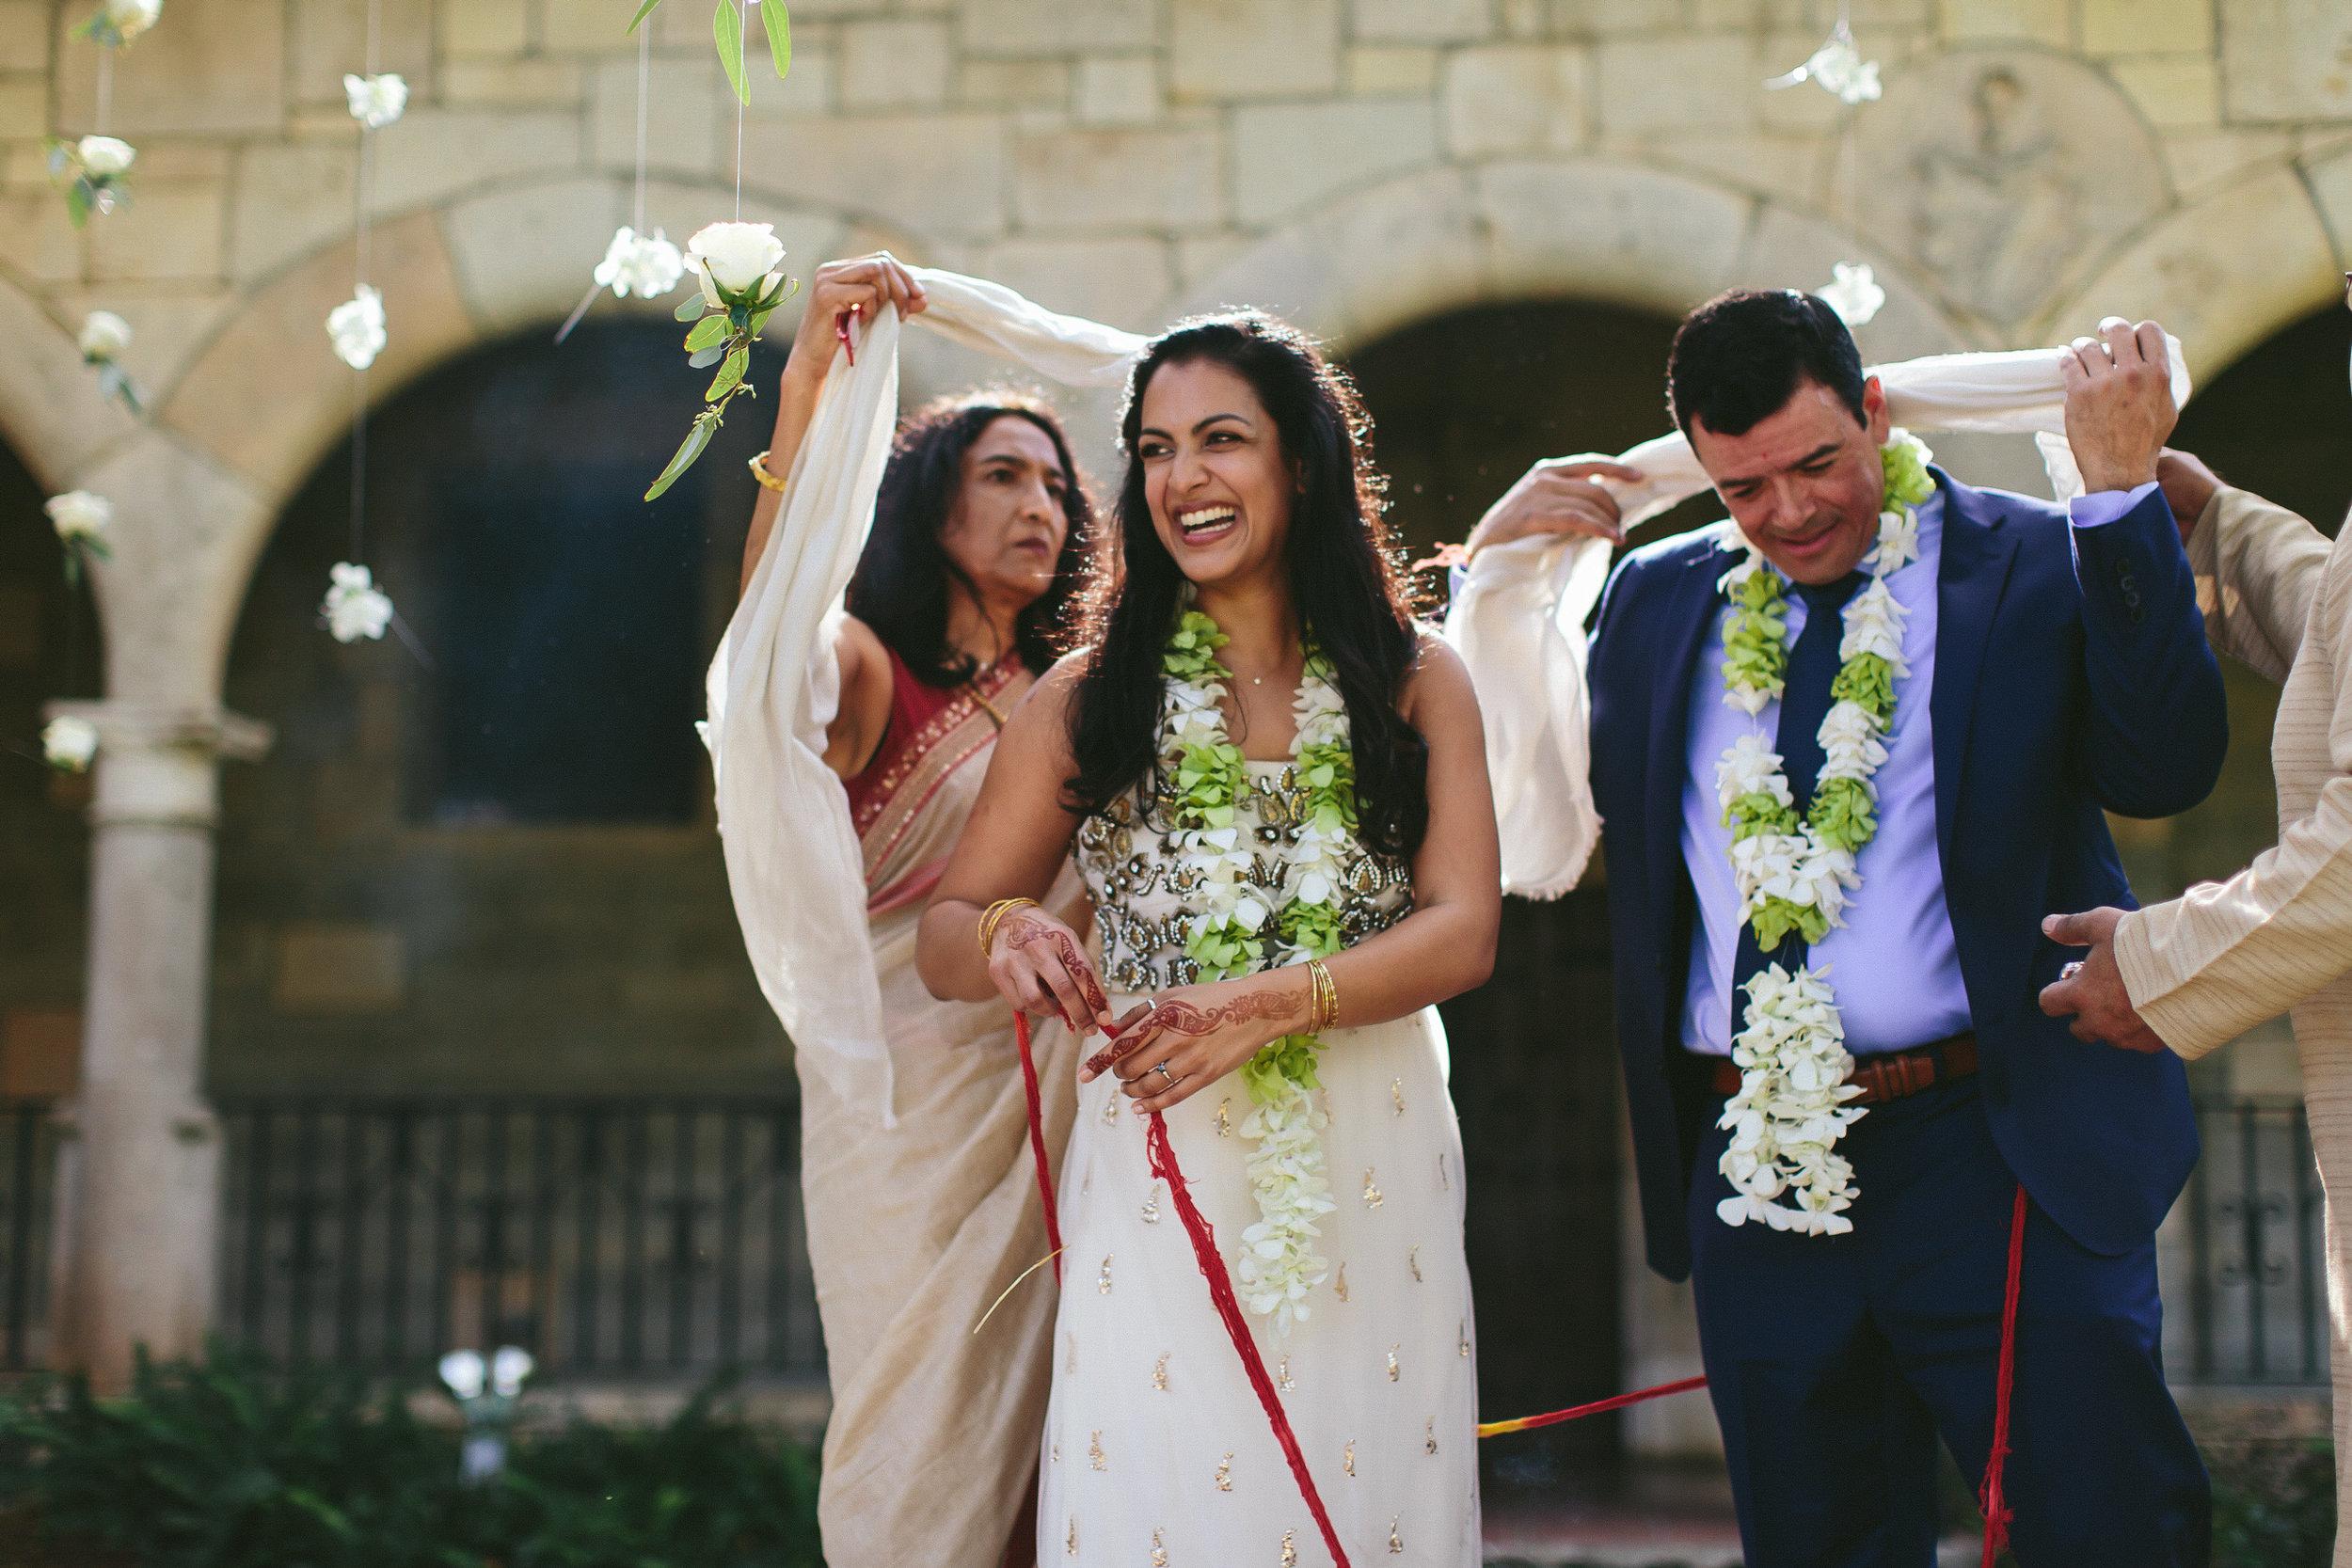 traditions-wedding-vizcaya-tiny-house-photo-luxury-wedding-photographer.jpg